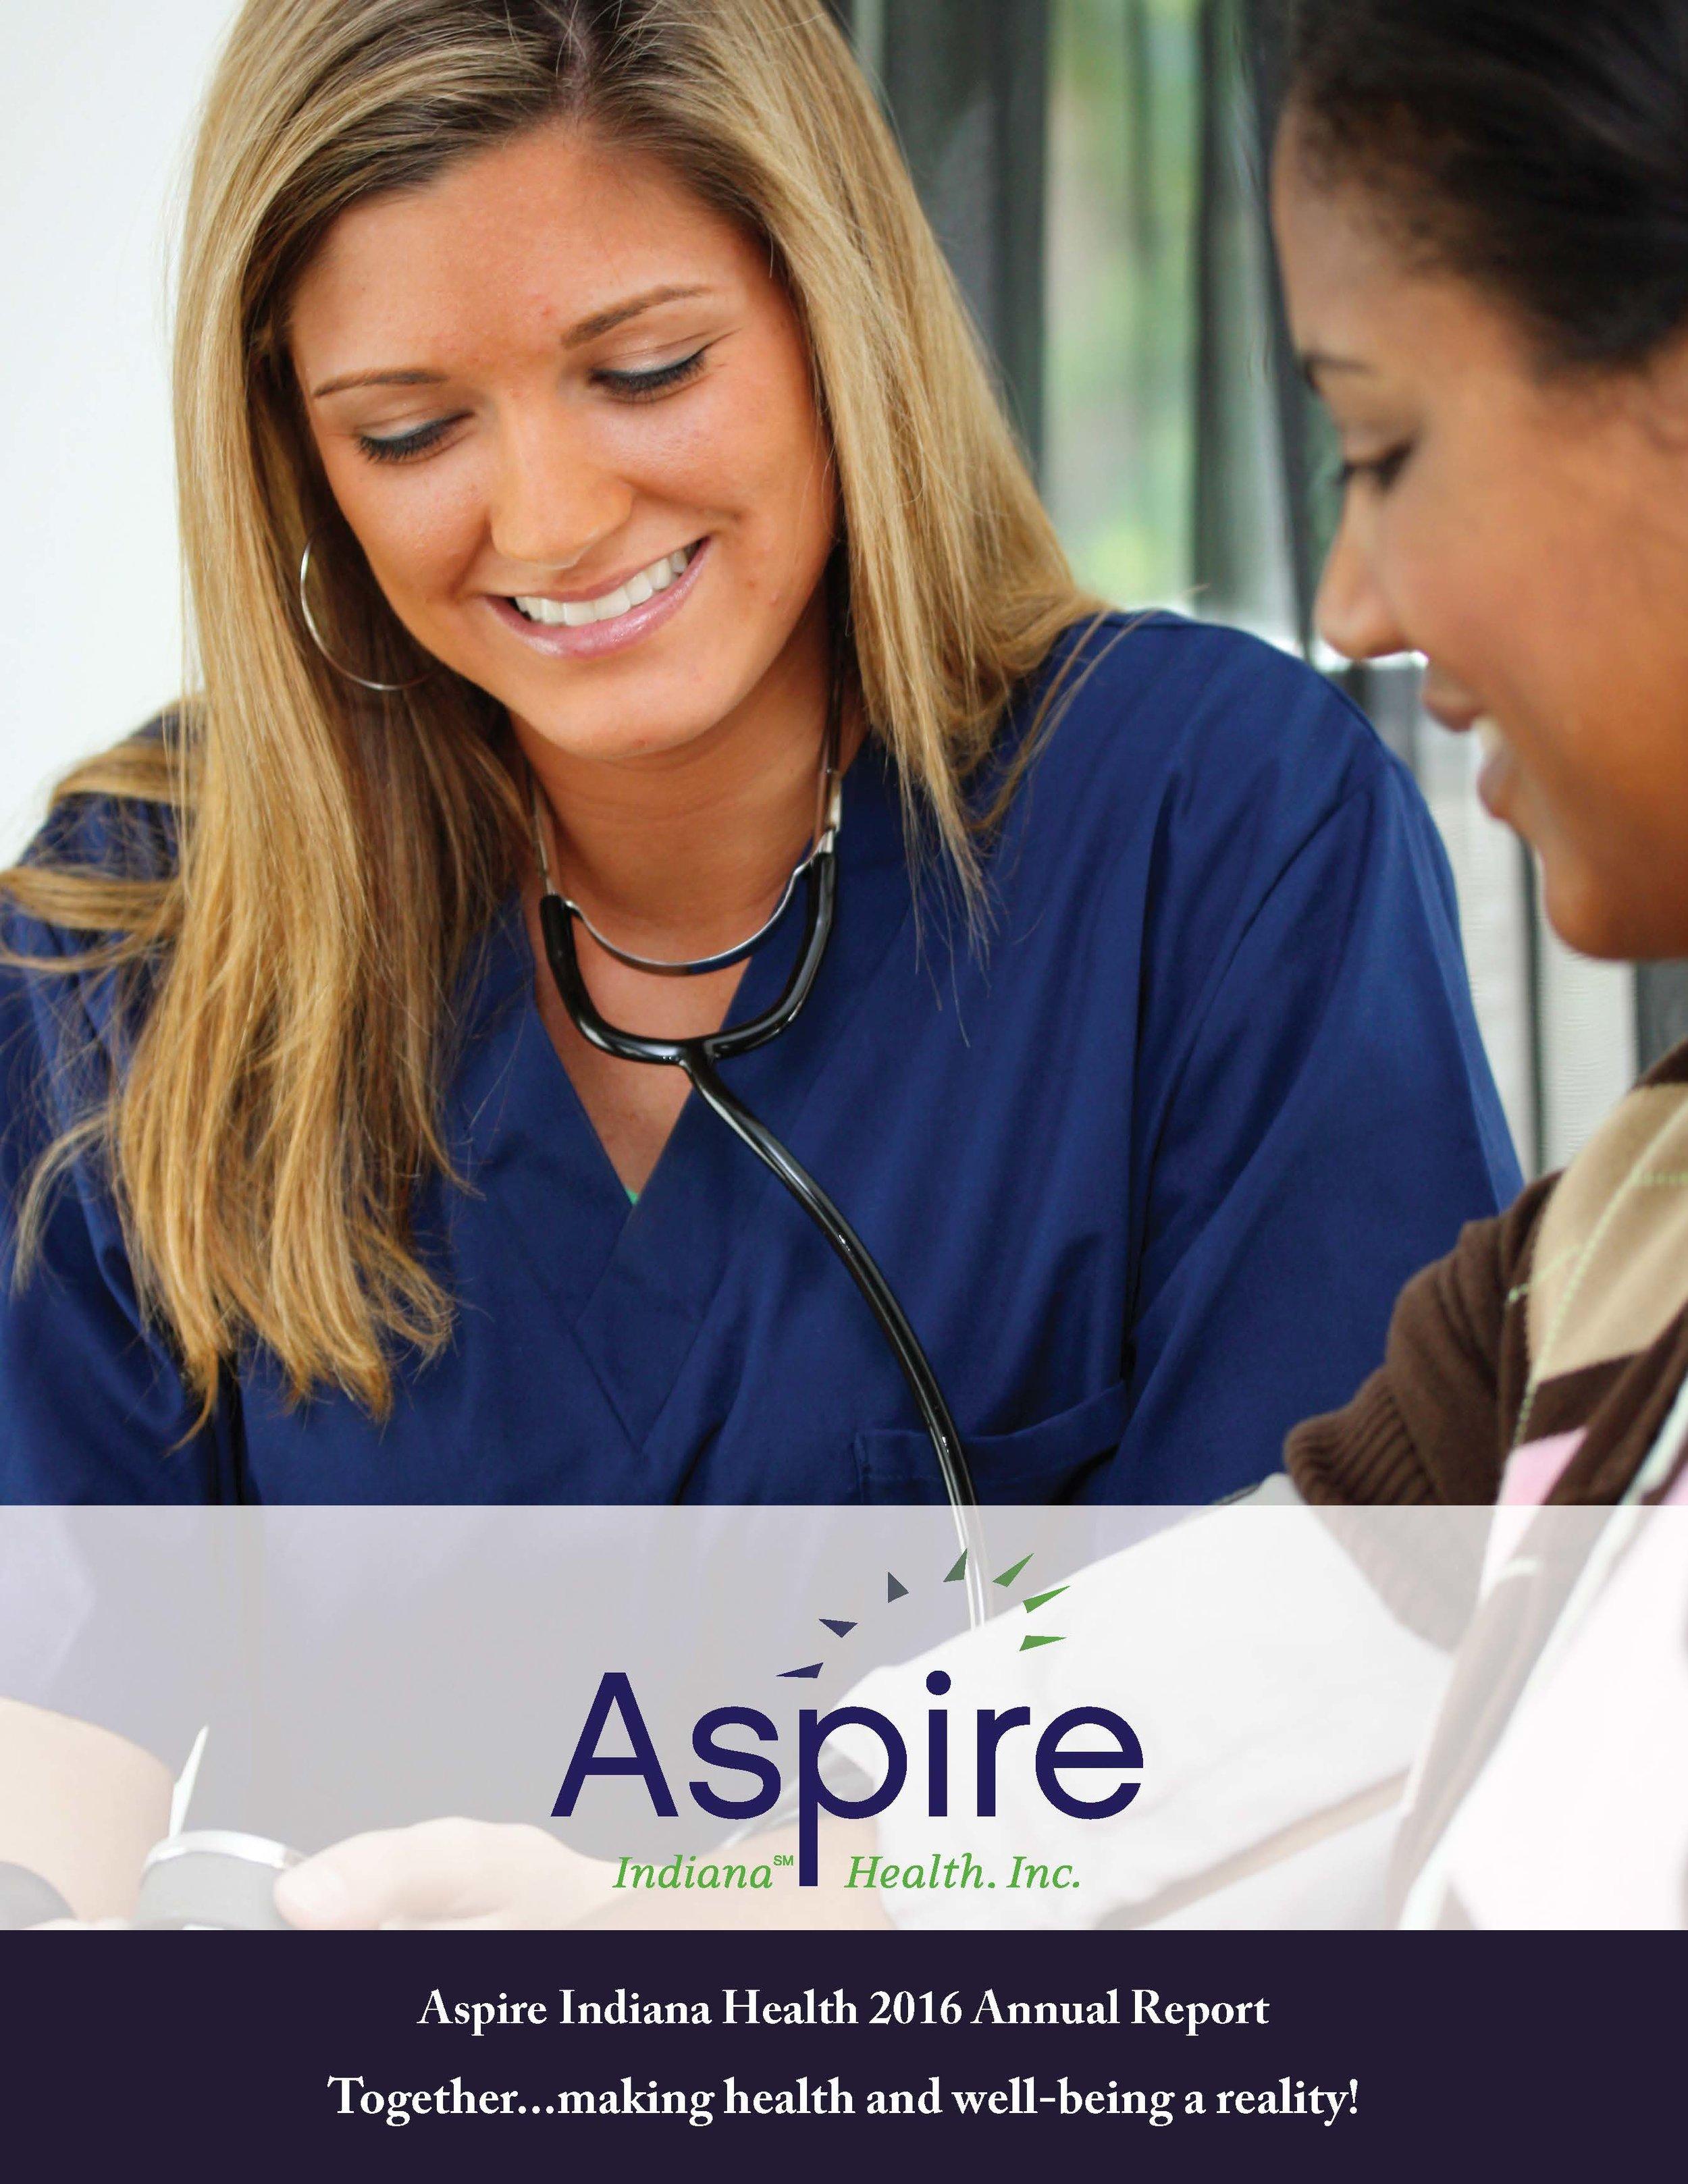 Aspire Indiana Health Annual Report 2016